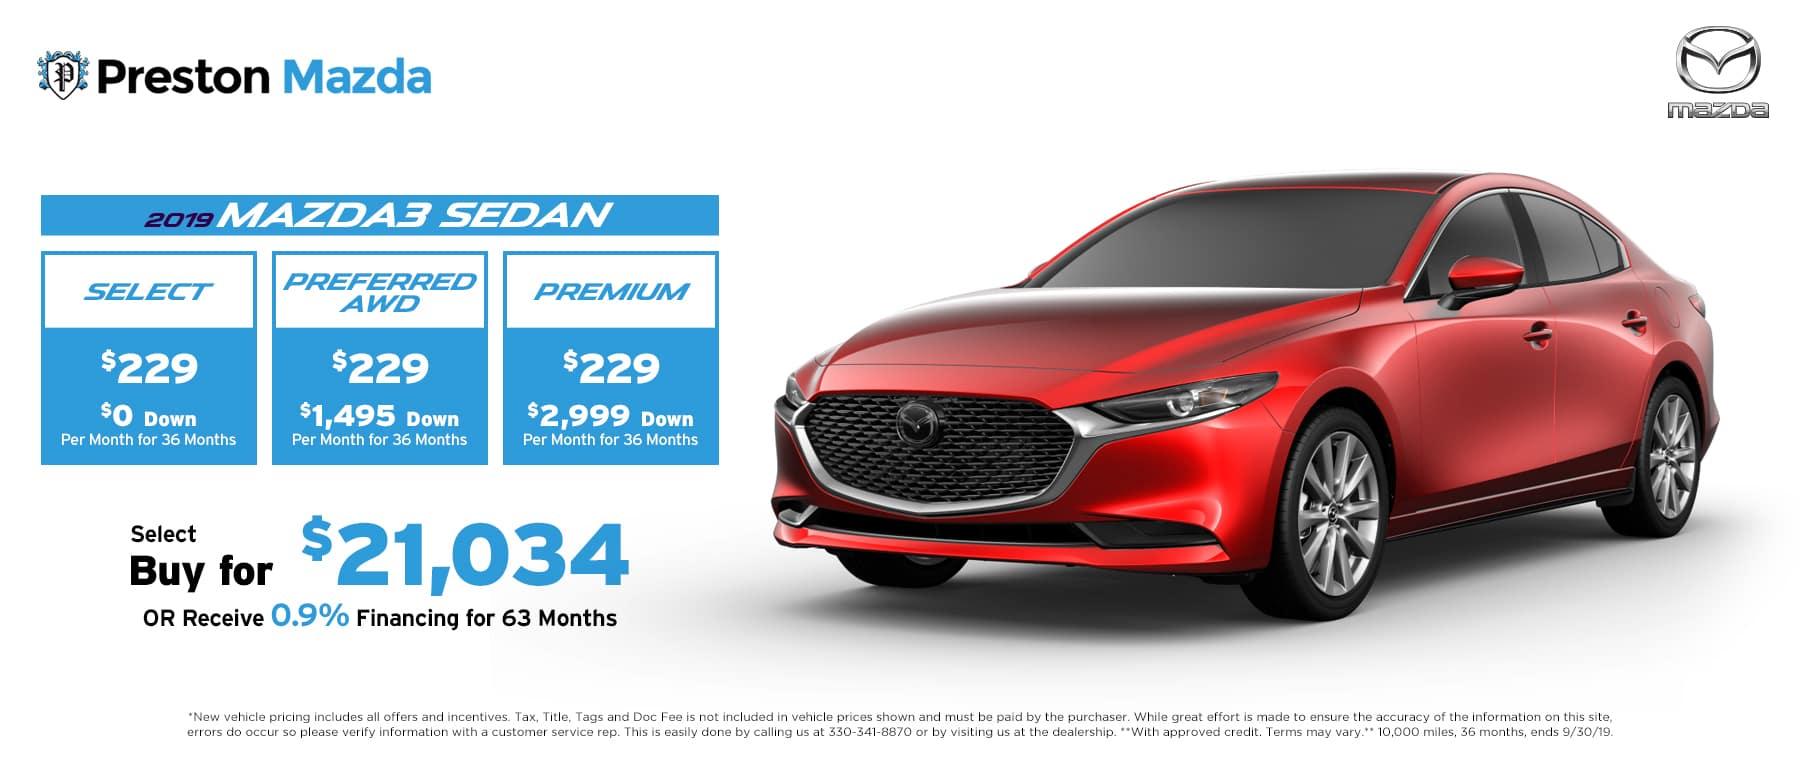 September special on the 2019 Mazda3